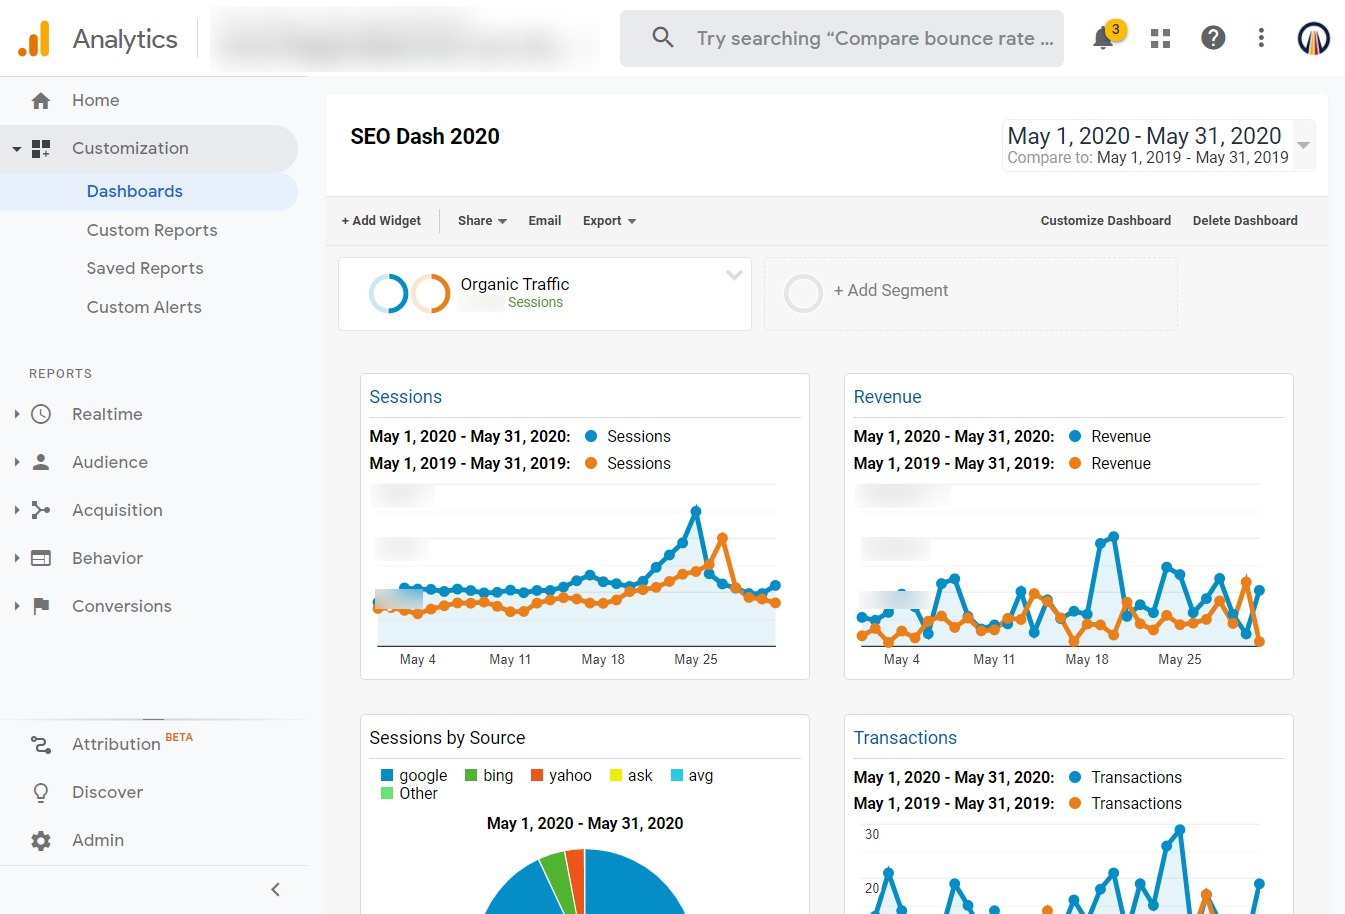 Dashboards aggregate key metrics into a single view.